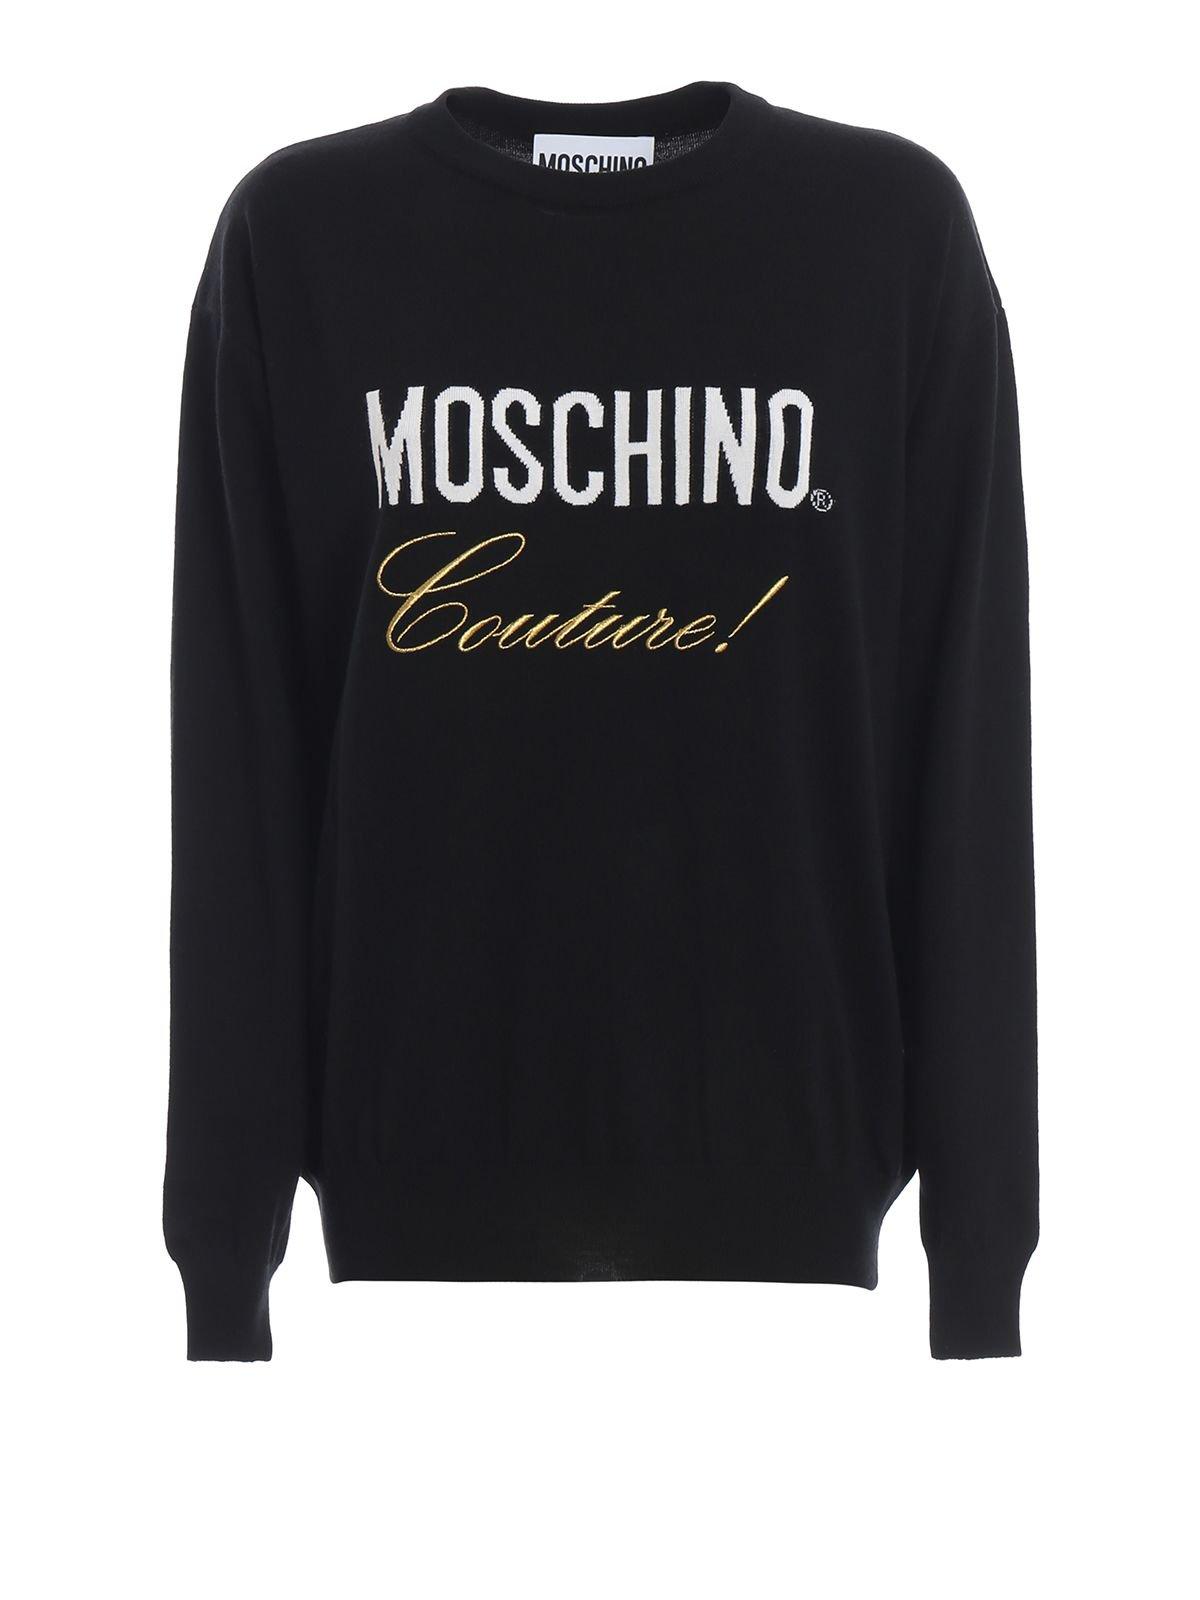 Moschino Logo Intarsia Black Wool Sweater